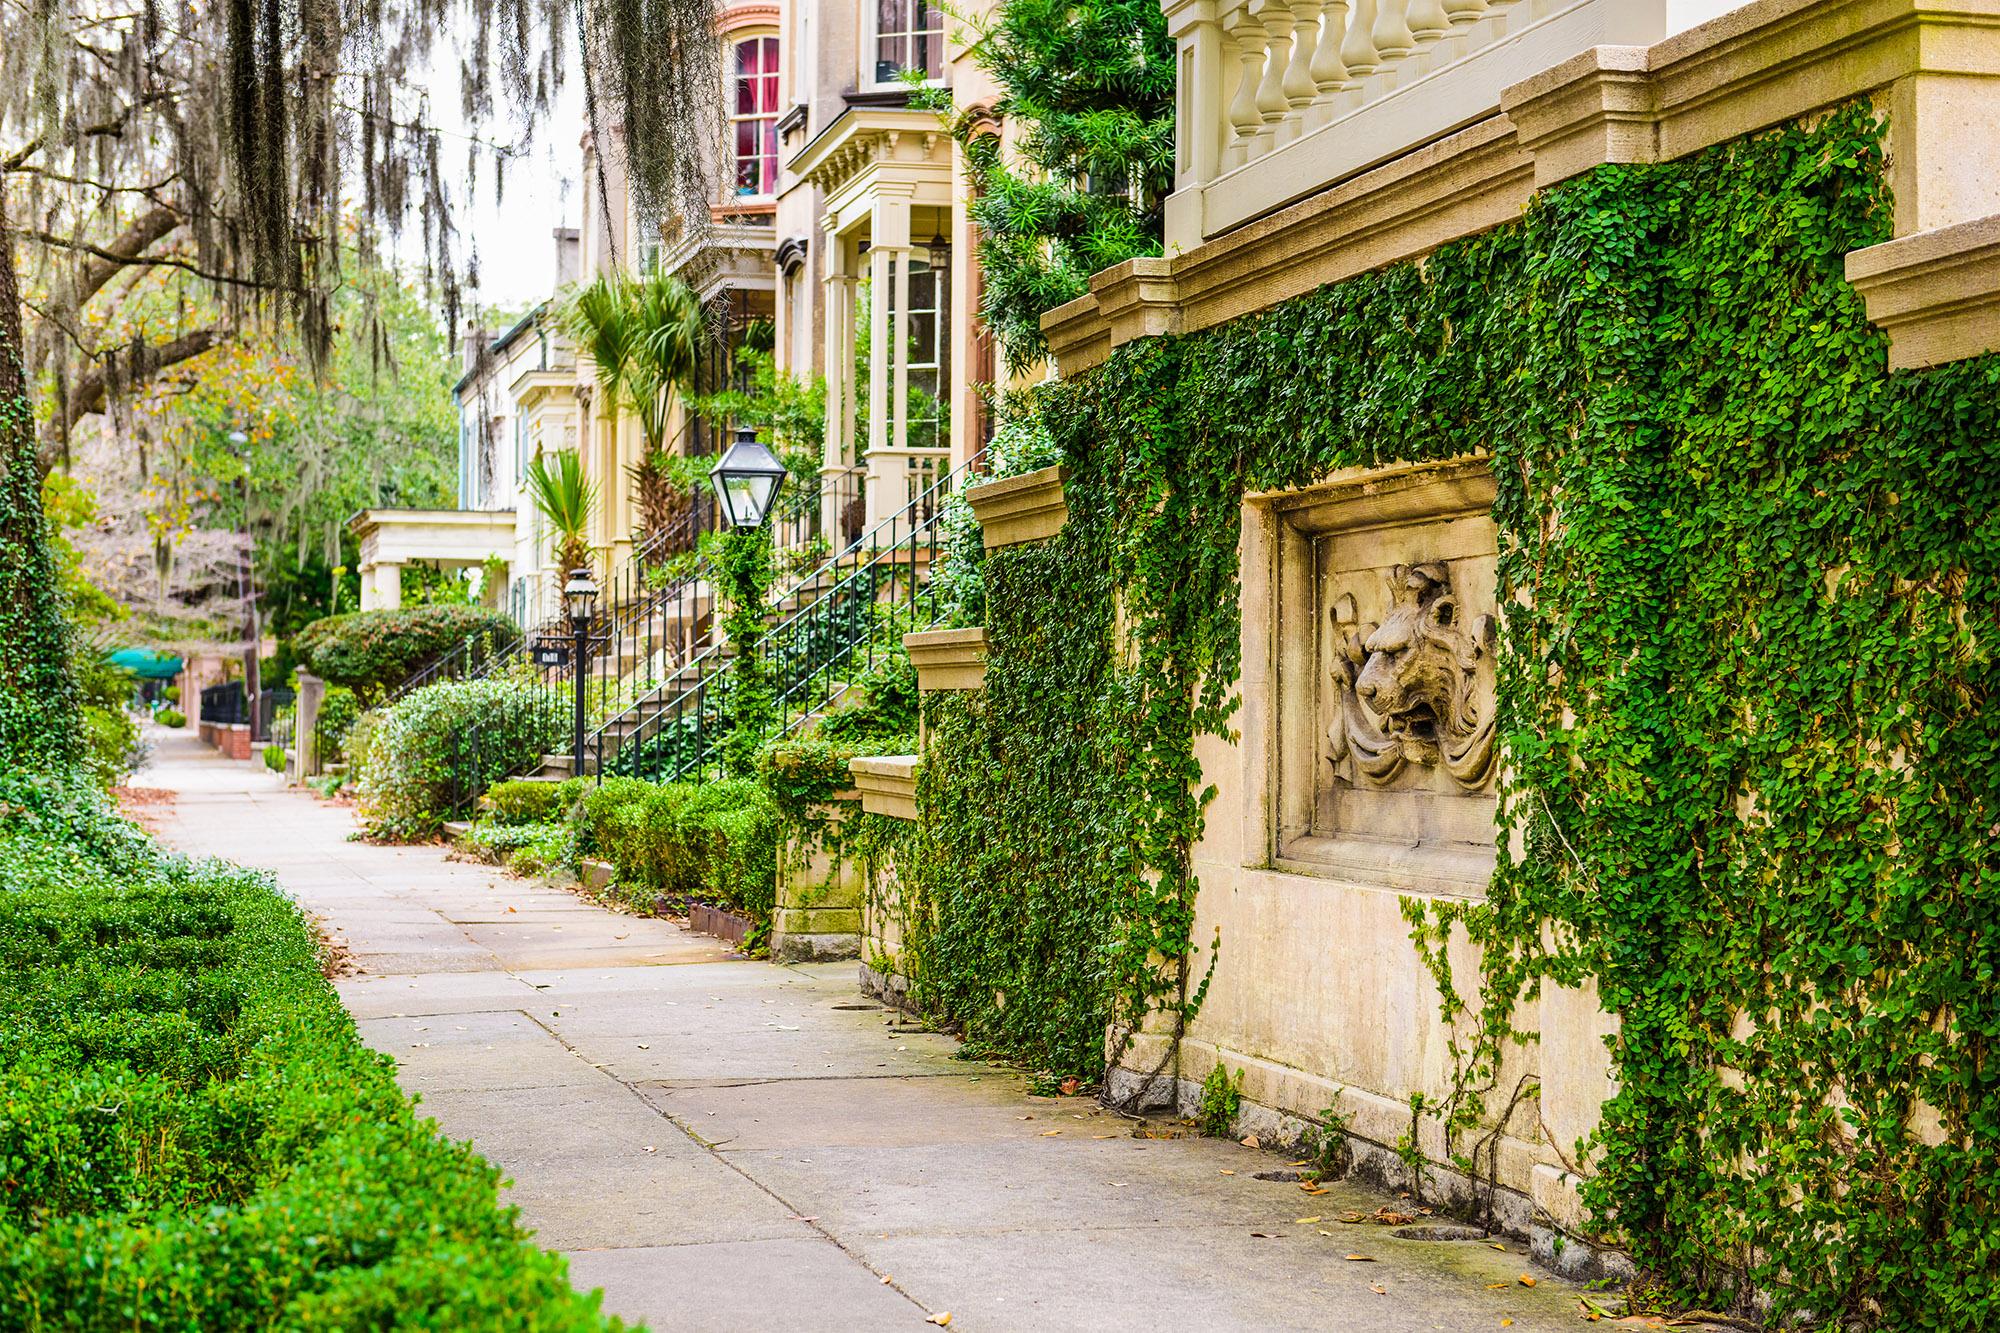 Street scape in Savannah